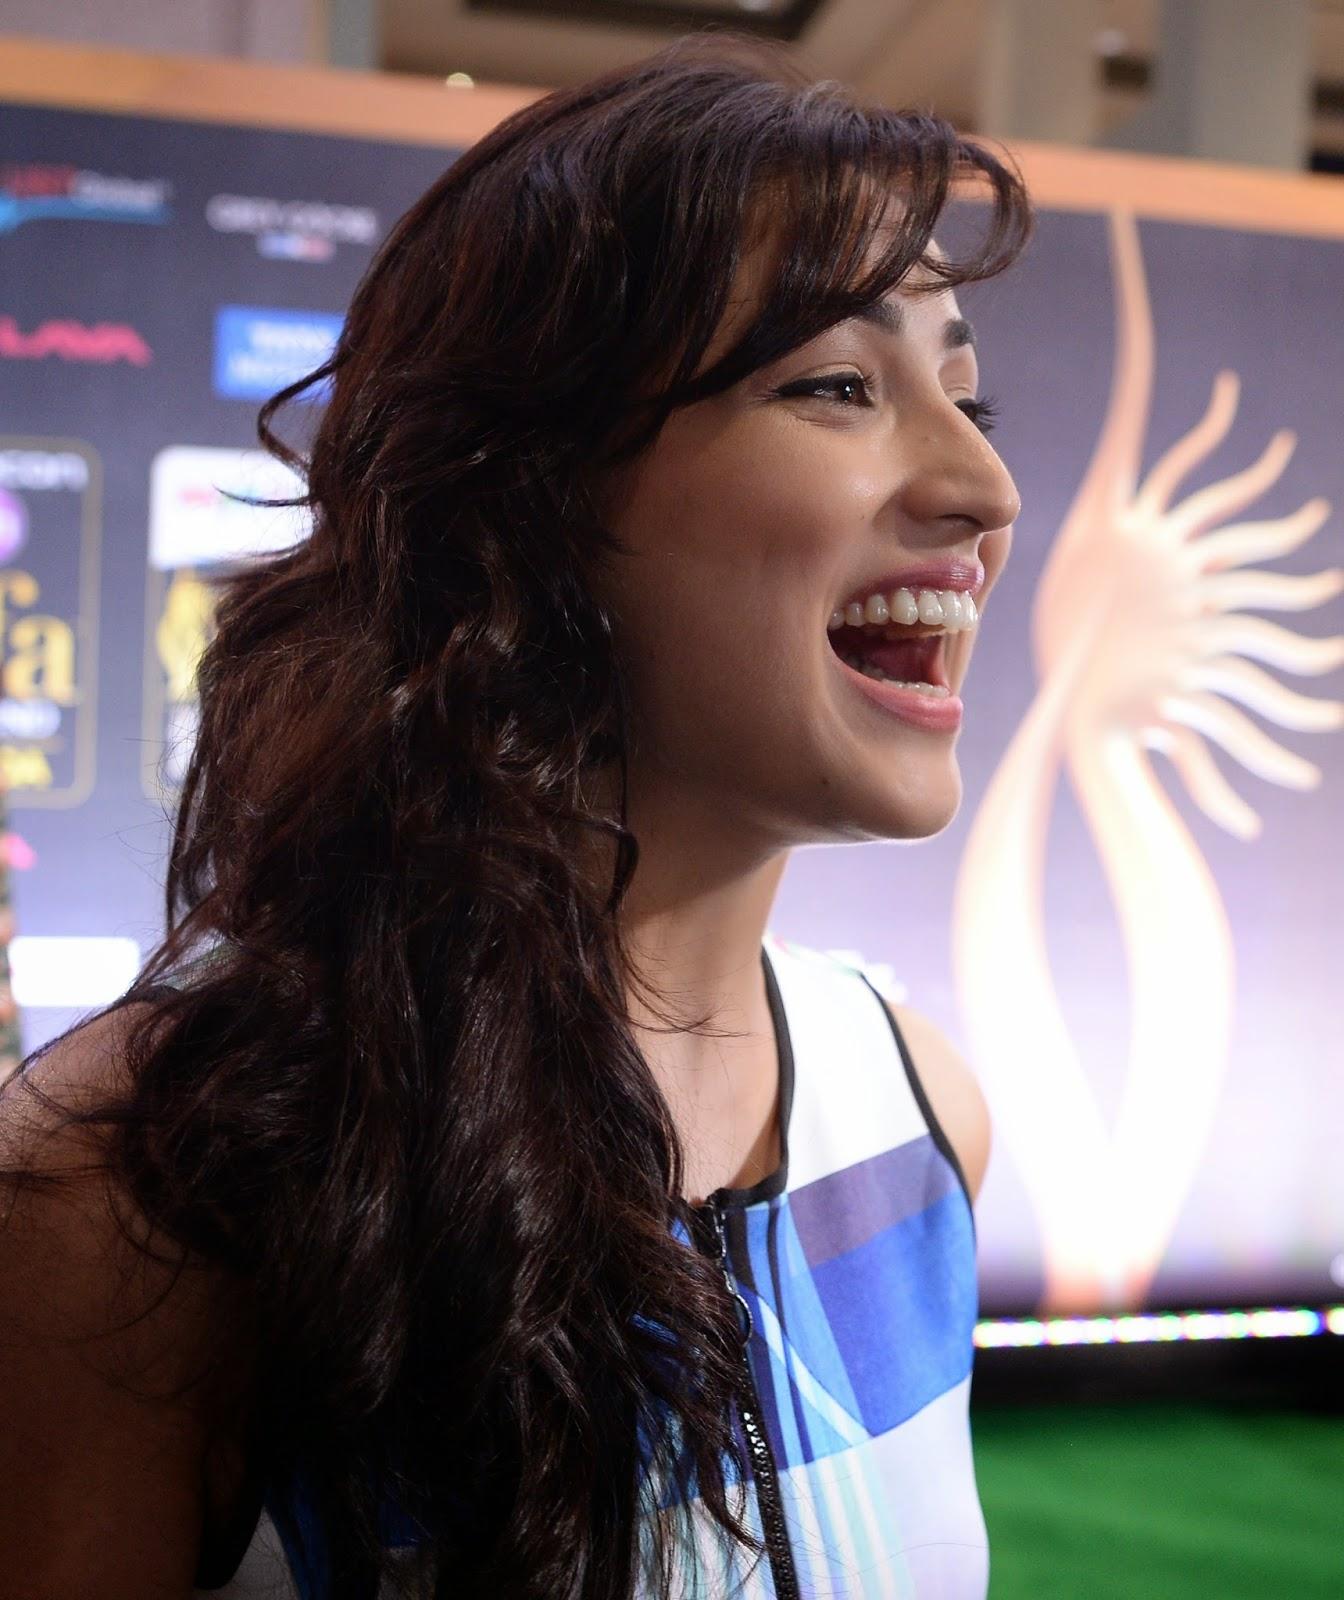 2014 IIFA Awards, Actress, Award Show, Bollywood, Bollywood actress, Entertainment, IIFA, IIFA Awards, IIFA Pictures, IIFA Rocks, International Indian Film Academy, Tampa, Yami Gautam, Yami Gautam Pictures,